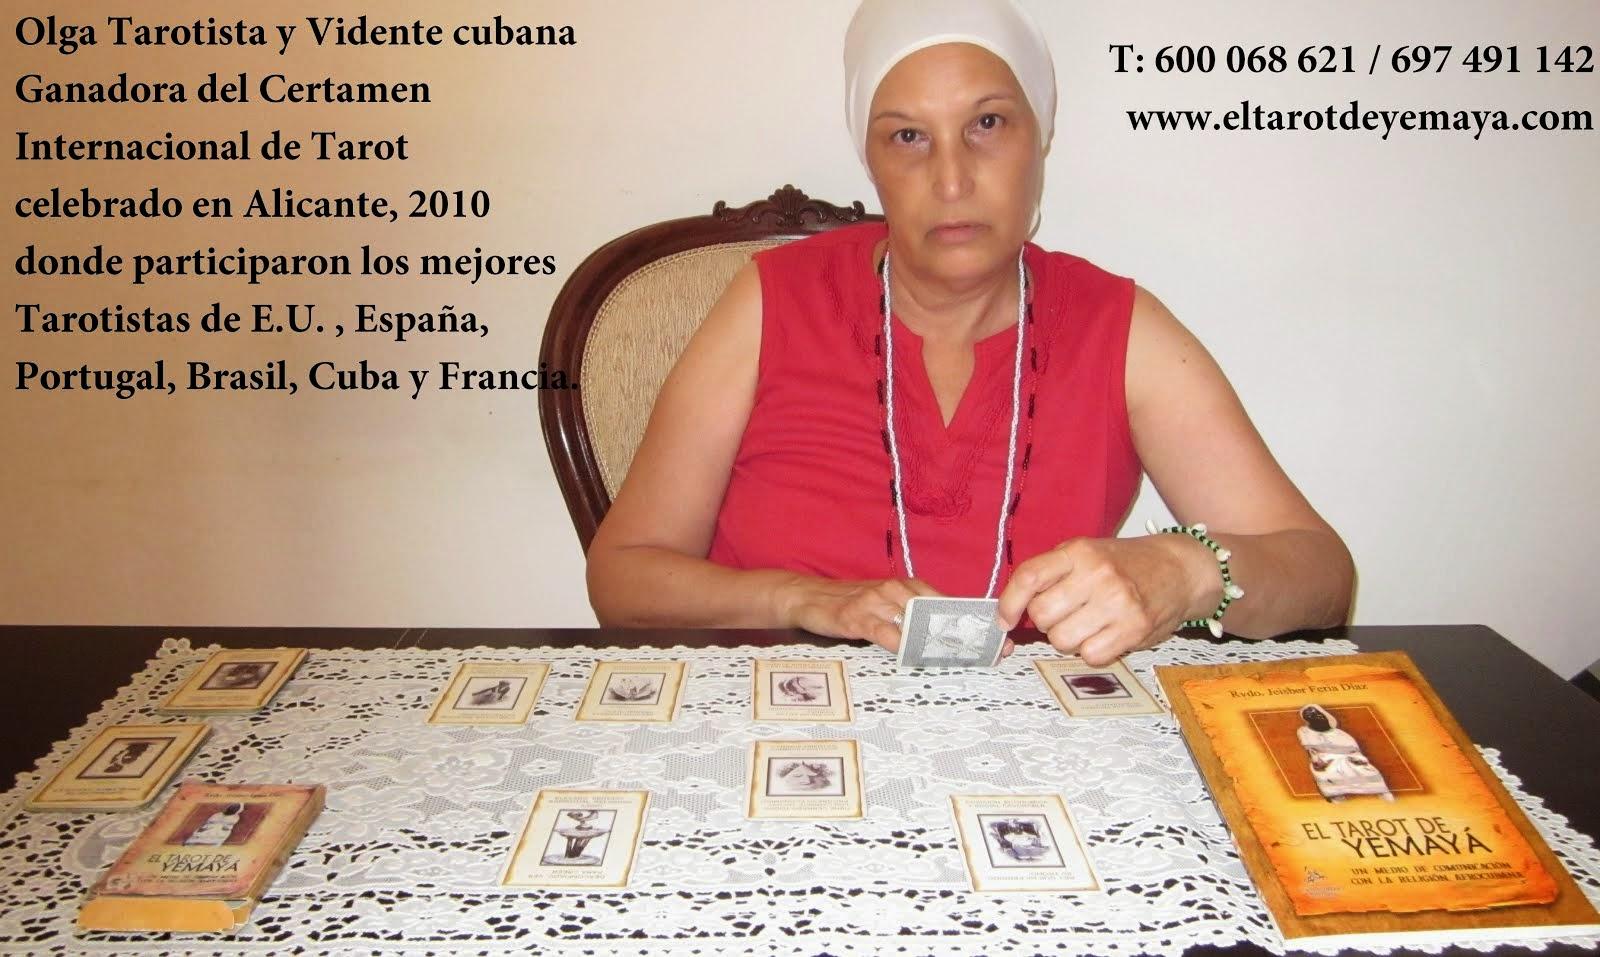 Mejor Tarotista del Mundo, Olga Díaz